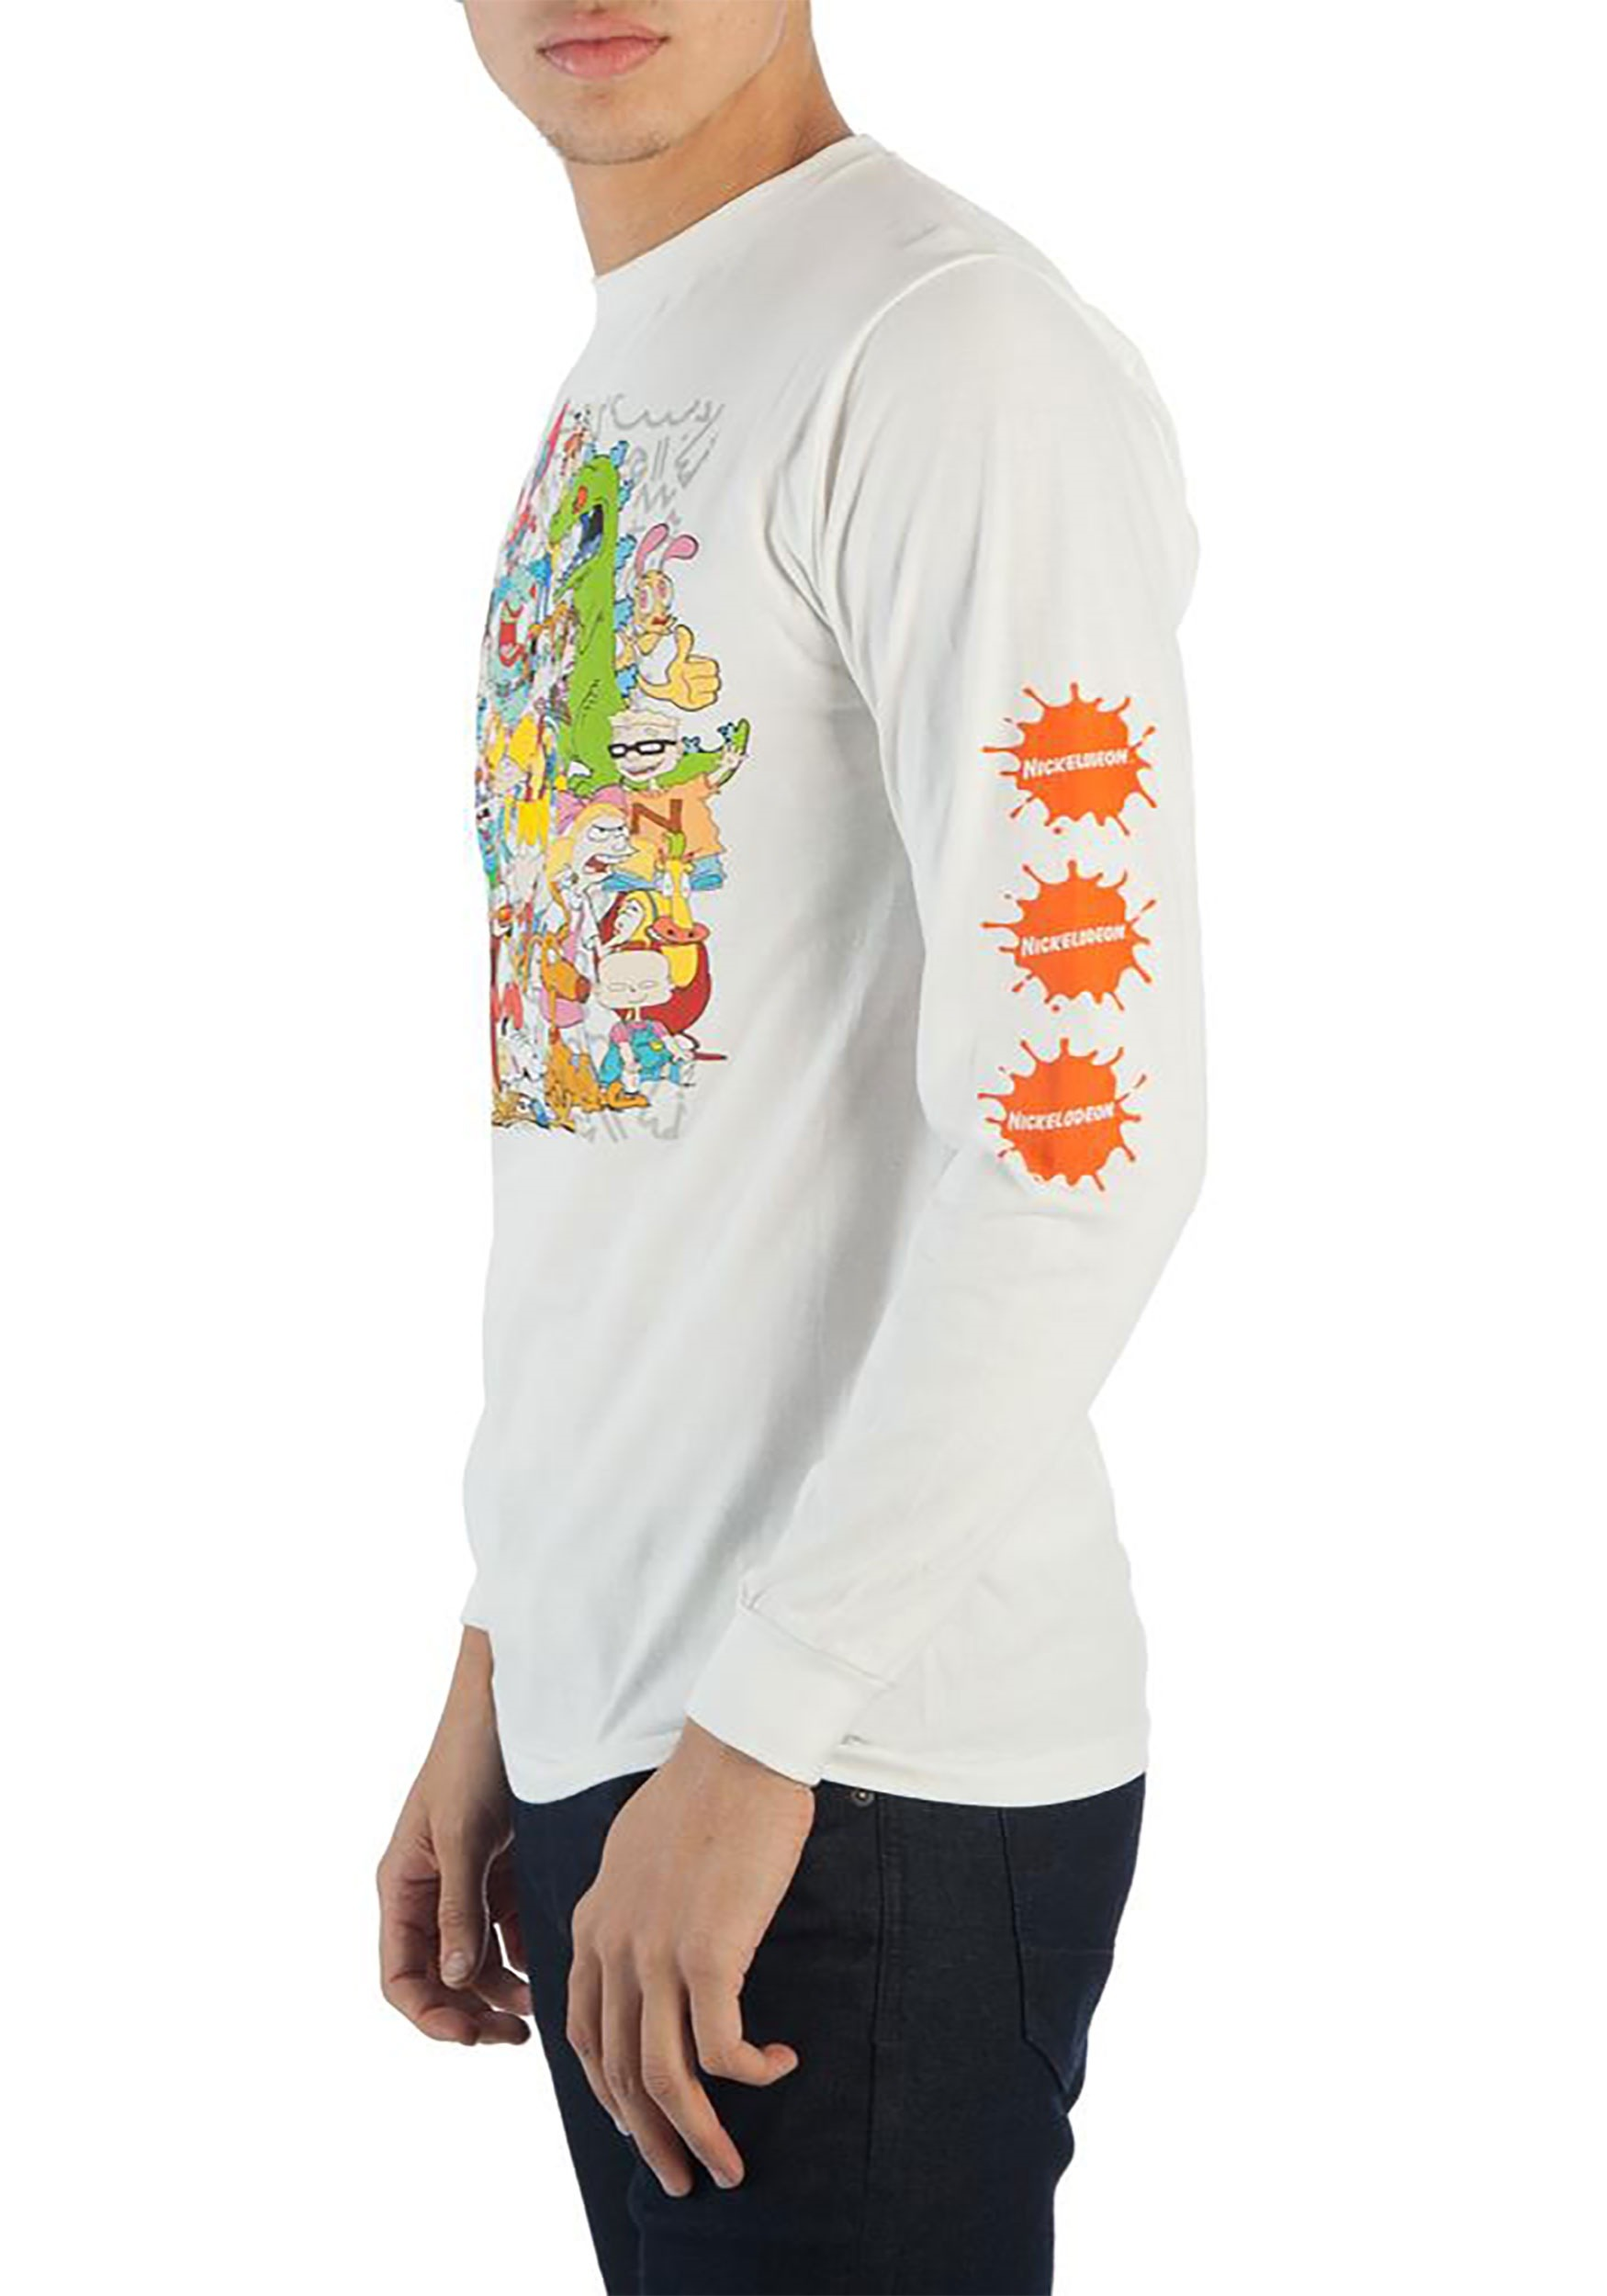 5c2b8cf68dc 90s Nickelodeon Characters Group Long Sleeve Tee